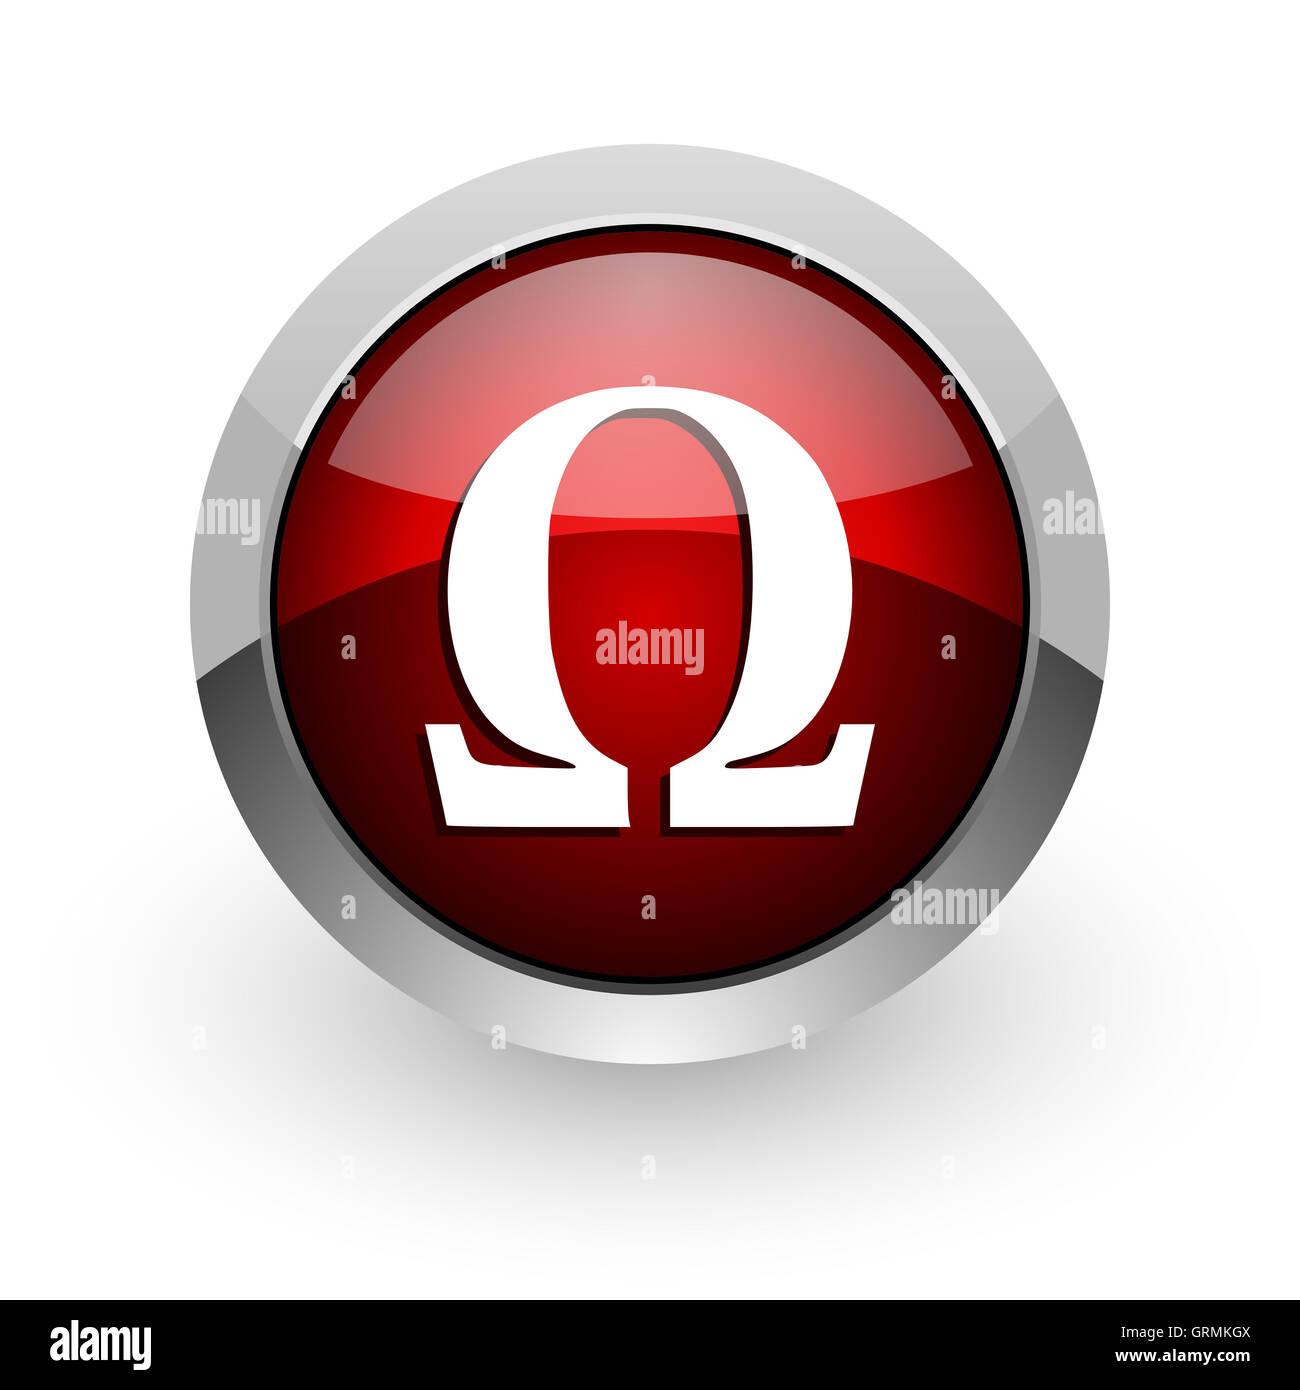 Omega red circle web glossy icon stock photo royalty free image omega red circle web glossy icon buycottarizona